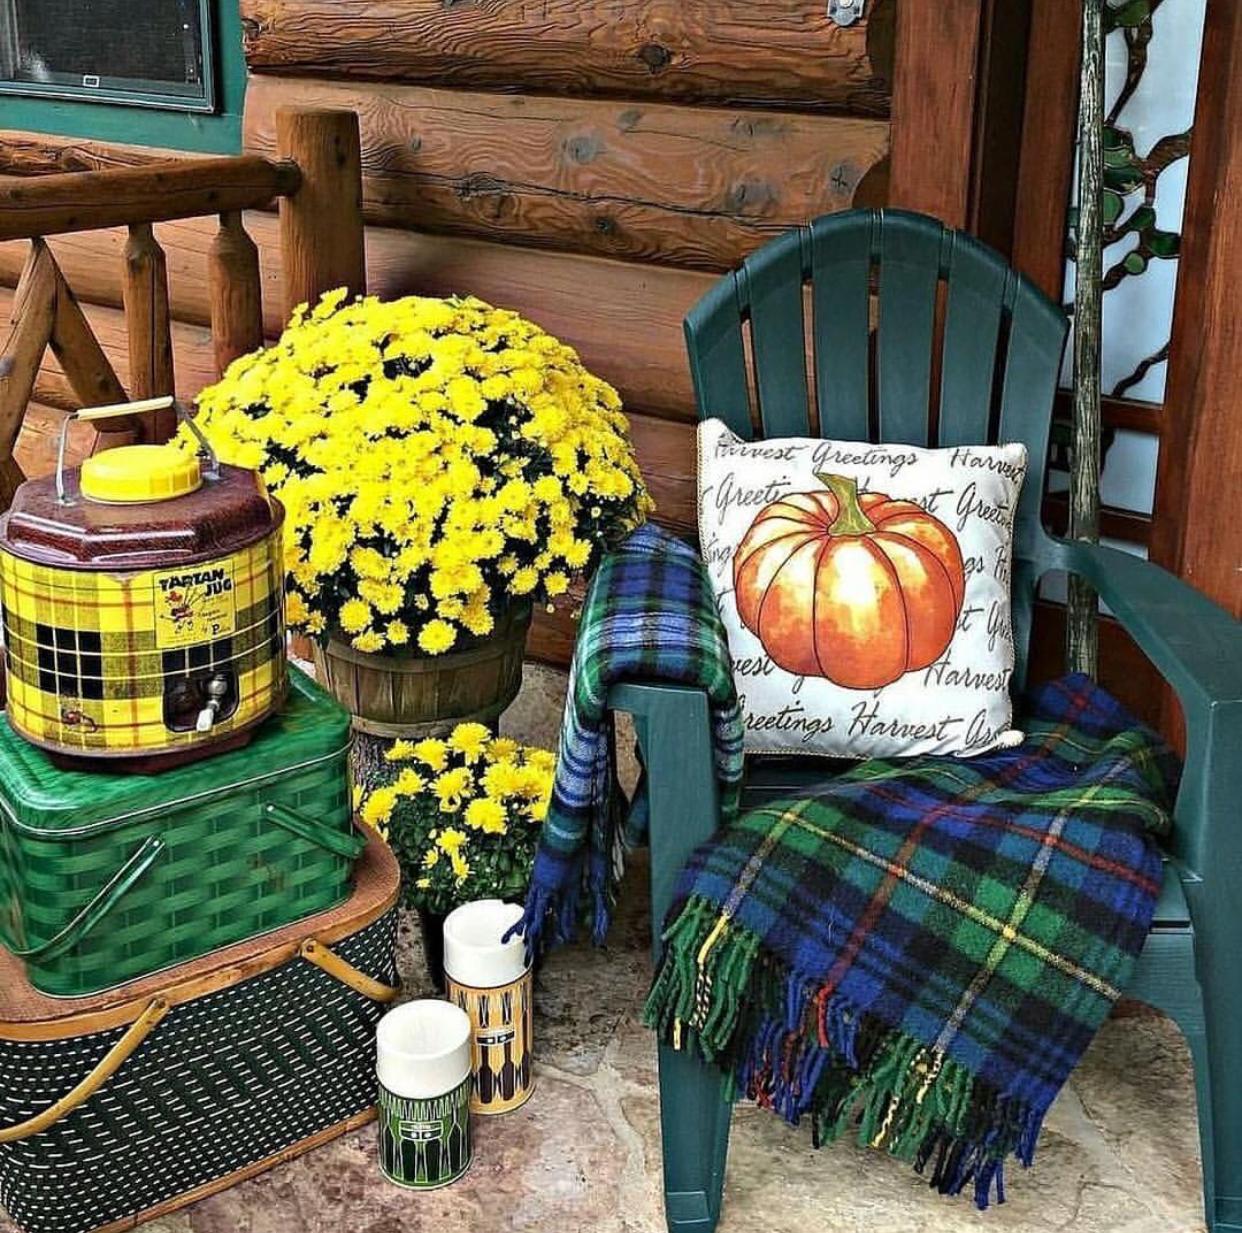 Fall Porch Decor, Vintage Decor, Rustic Decor, Log Cabin, Plaids